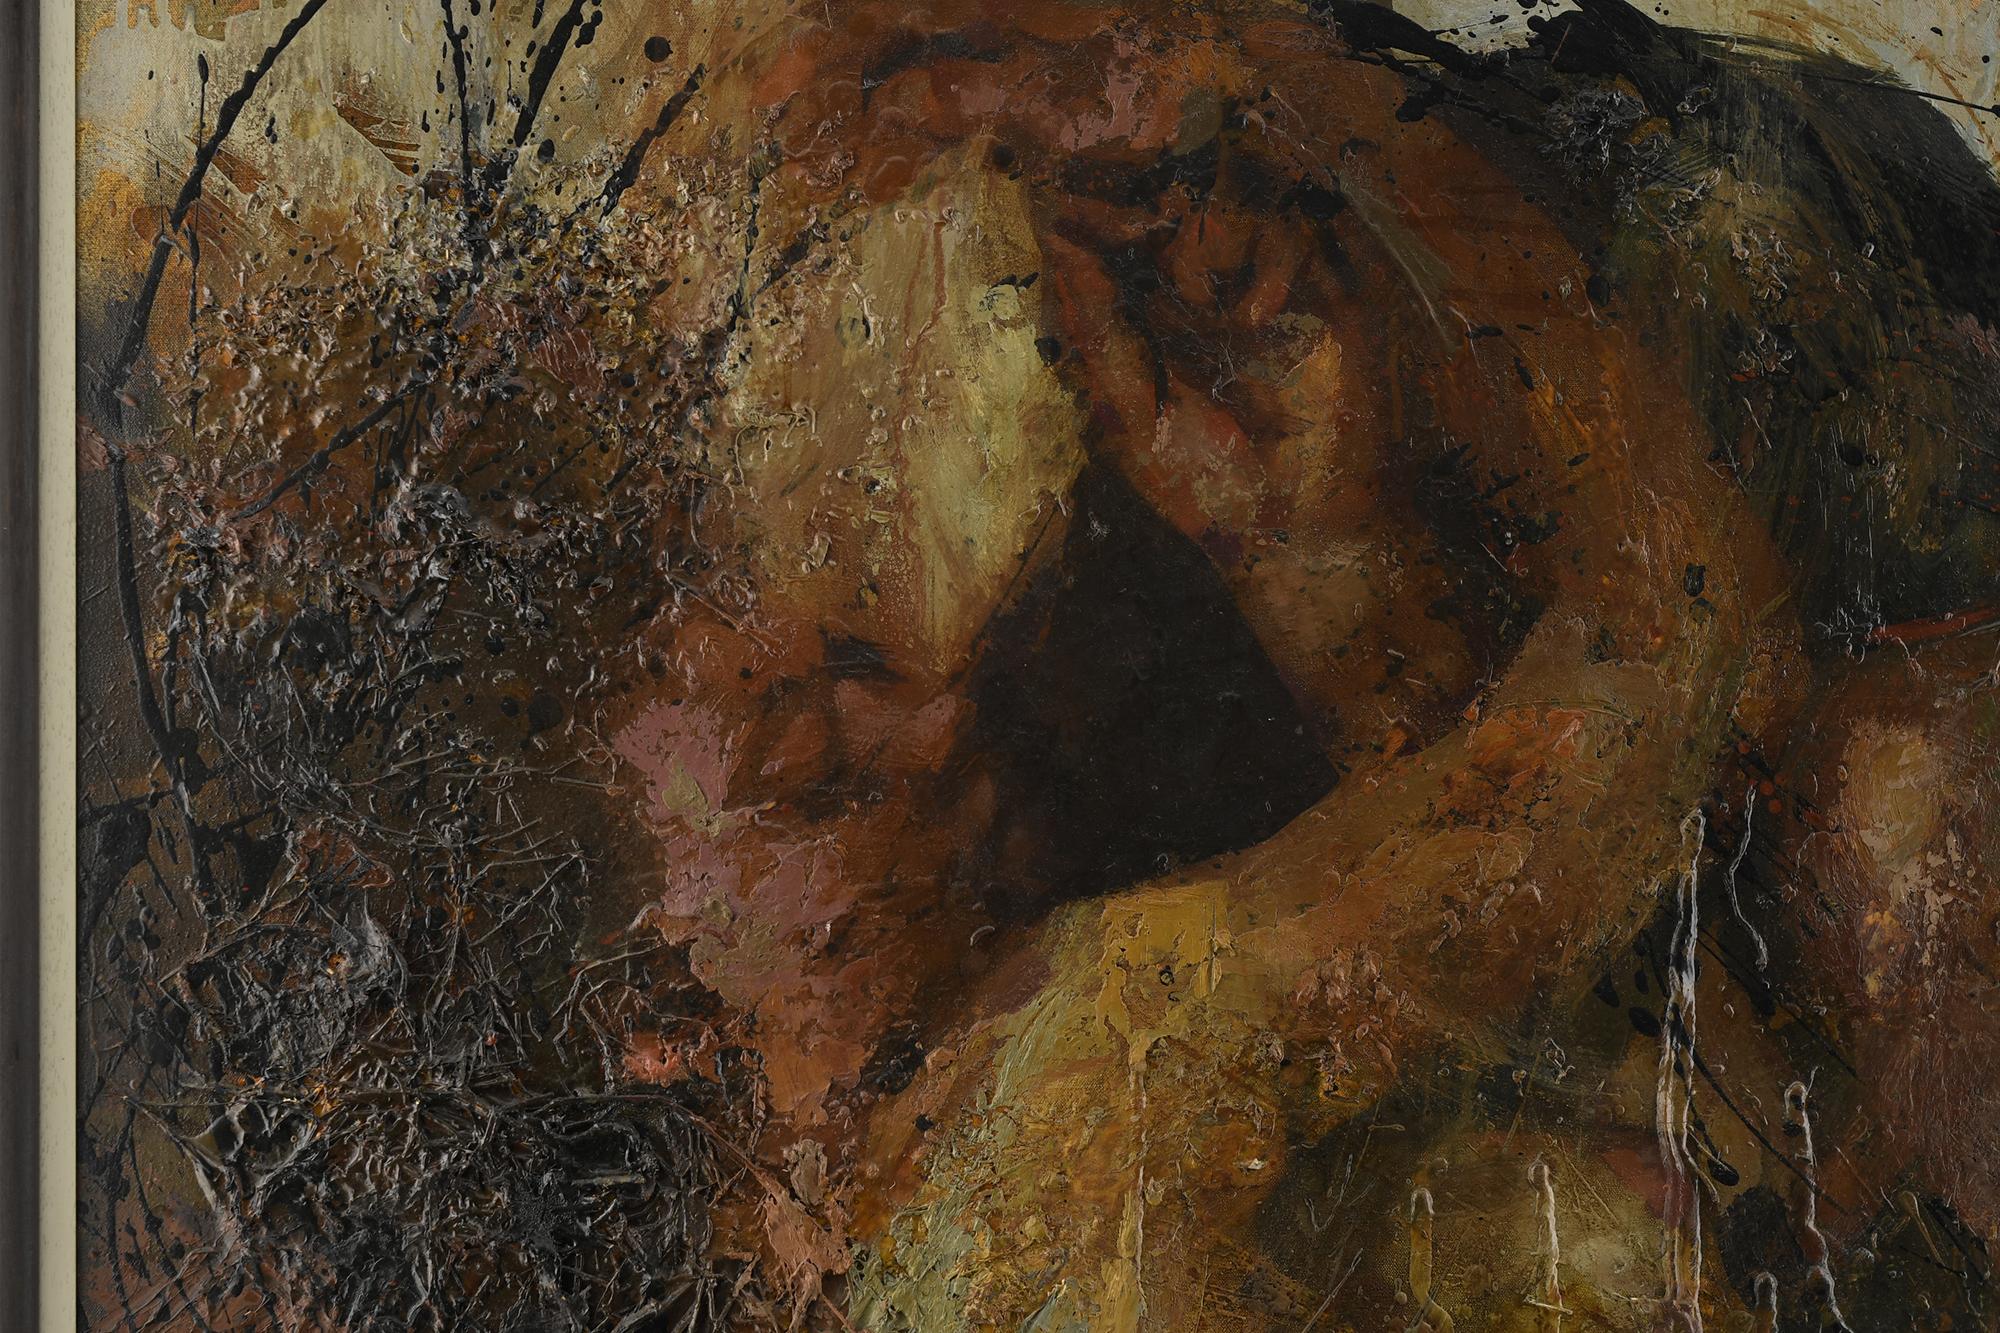 Stunning Original Painting by Renowned Scottish artist Alan McGowan. - Image 17 of 22